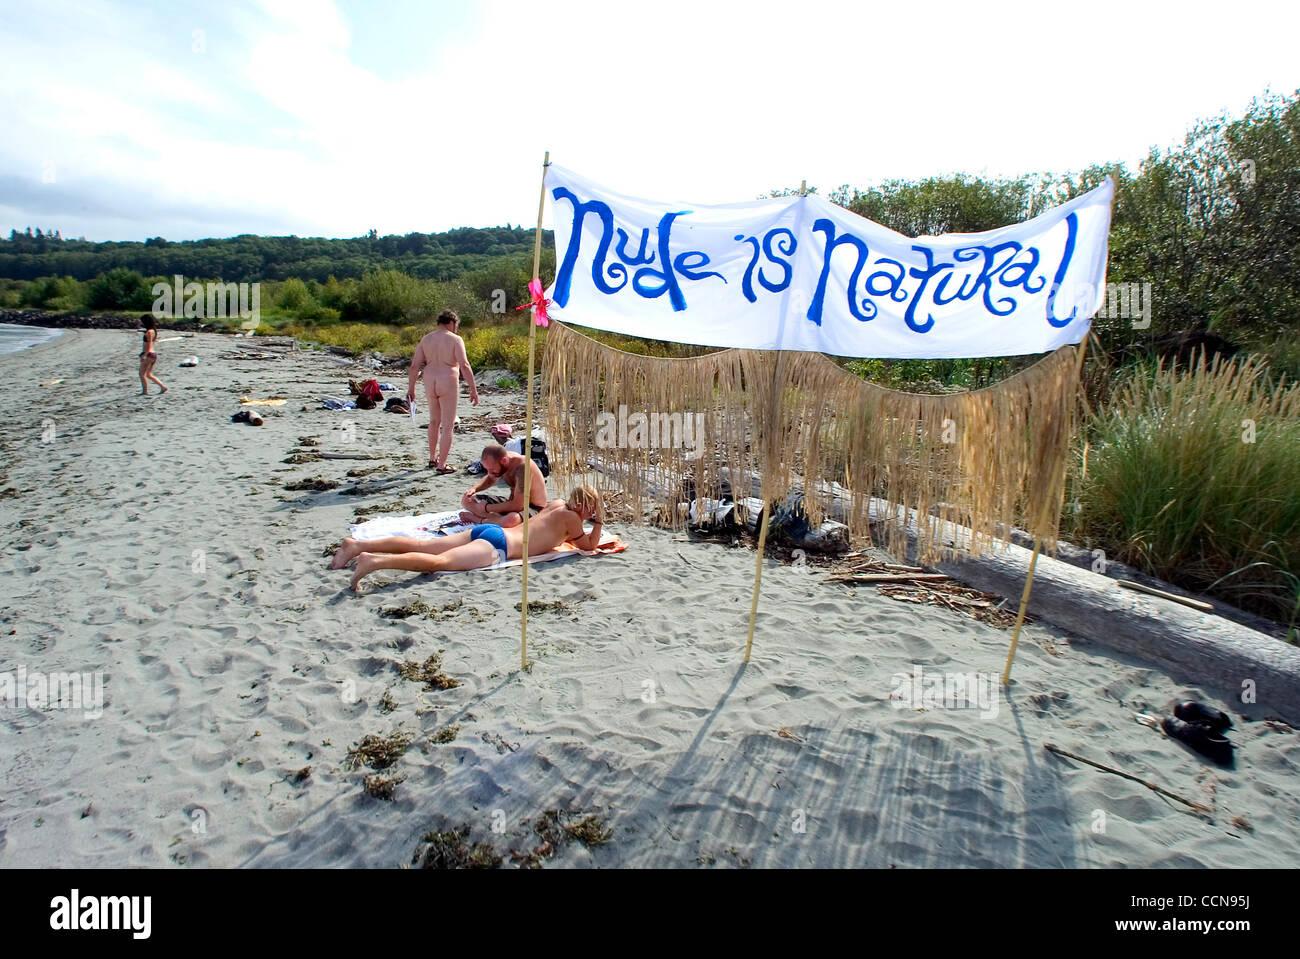 Nude beach in seattle photos